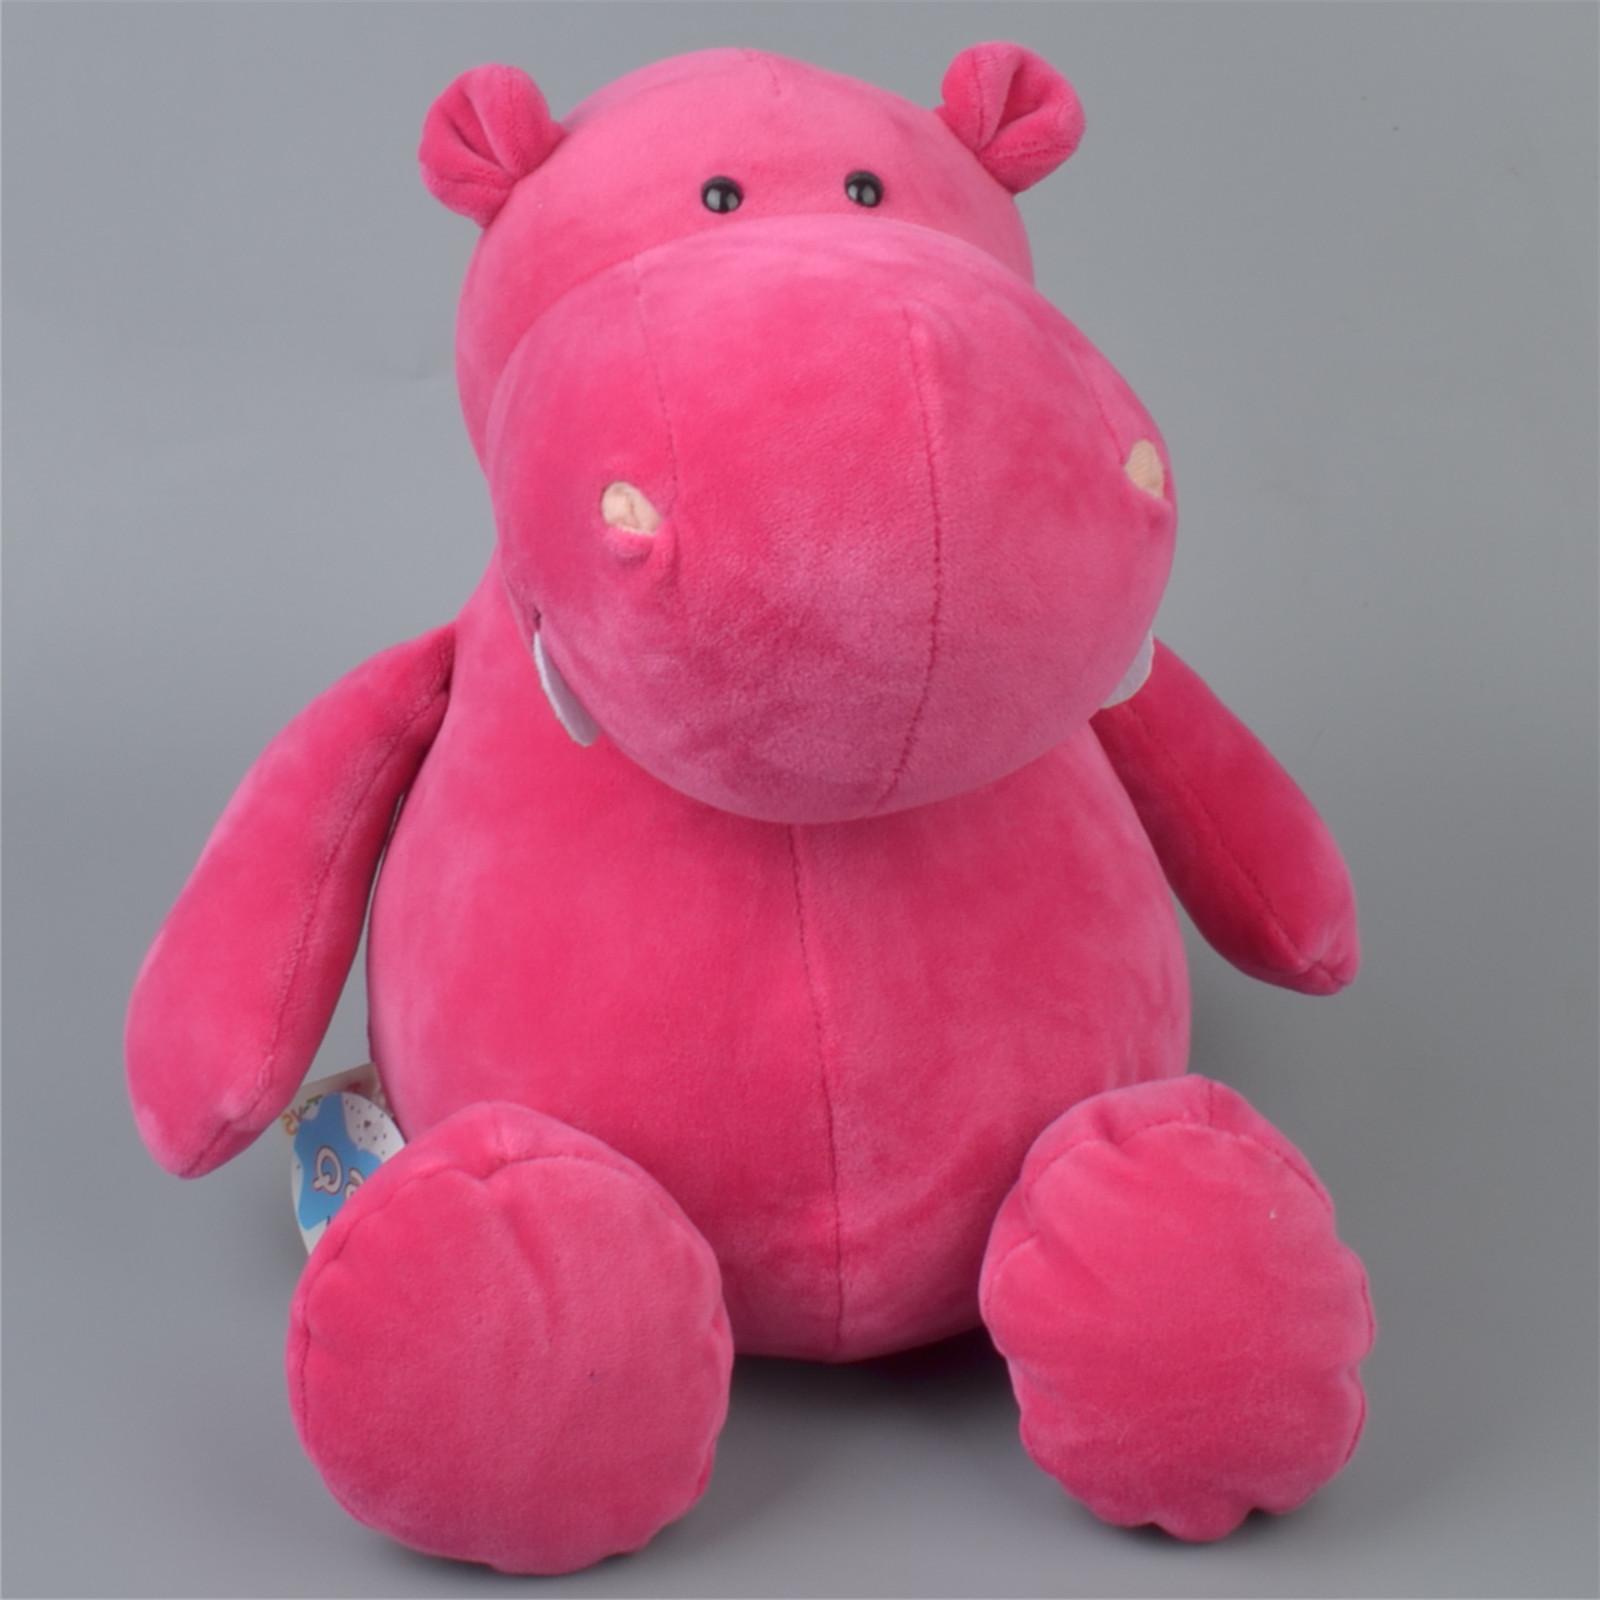 25 40 cm White pink Classic <font><b>zoo</b></font> <font><b>Stuffed</b></font> Kids Shipping